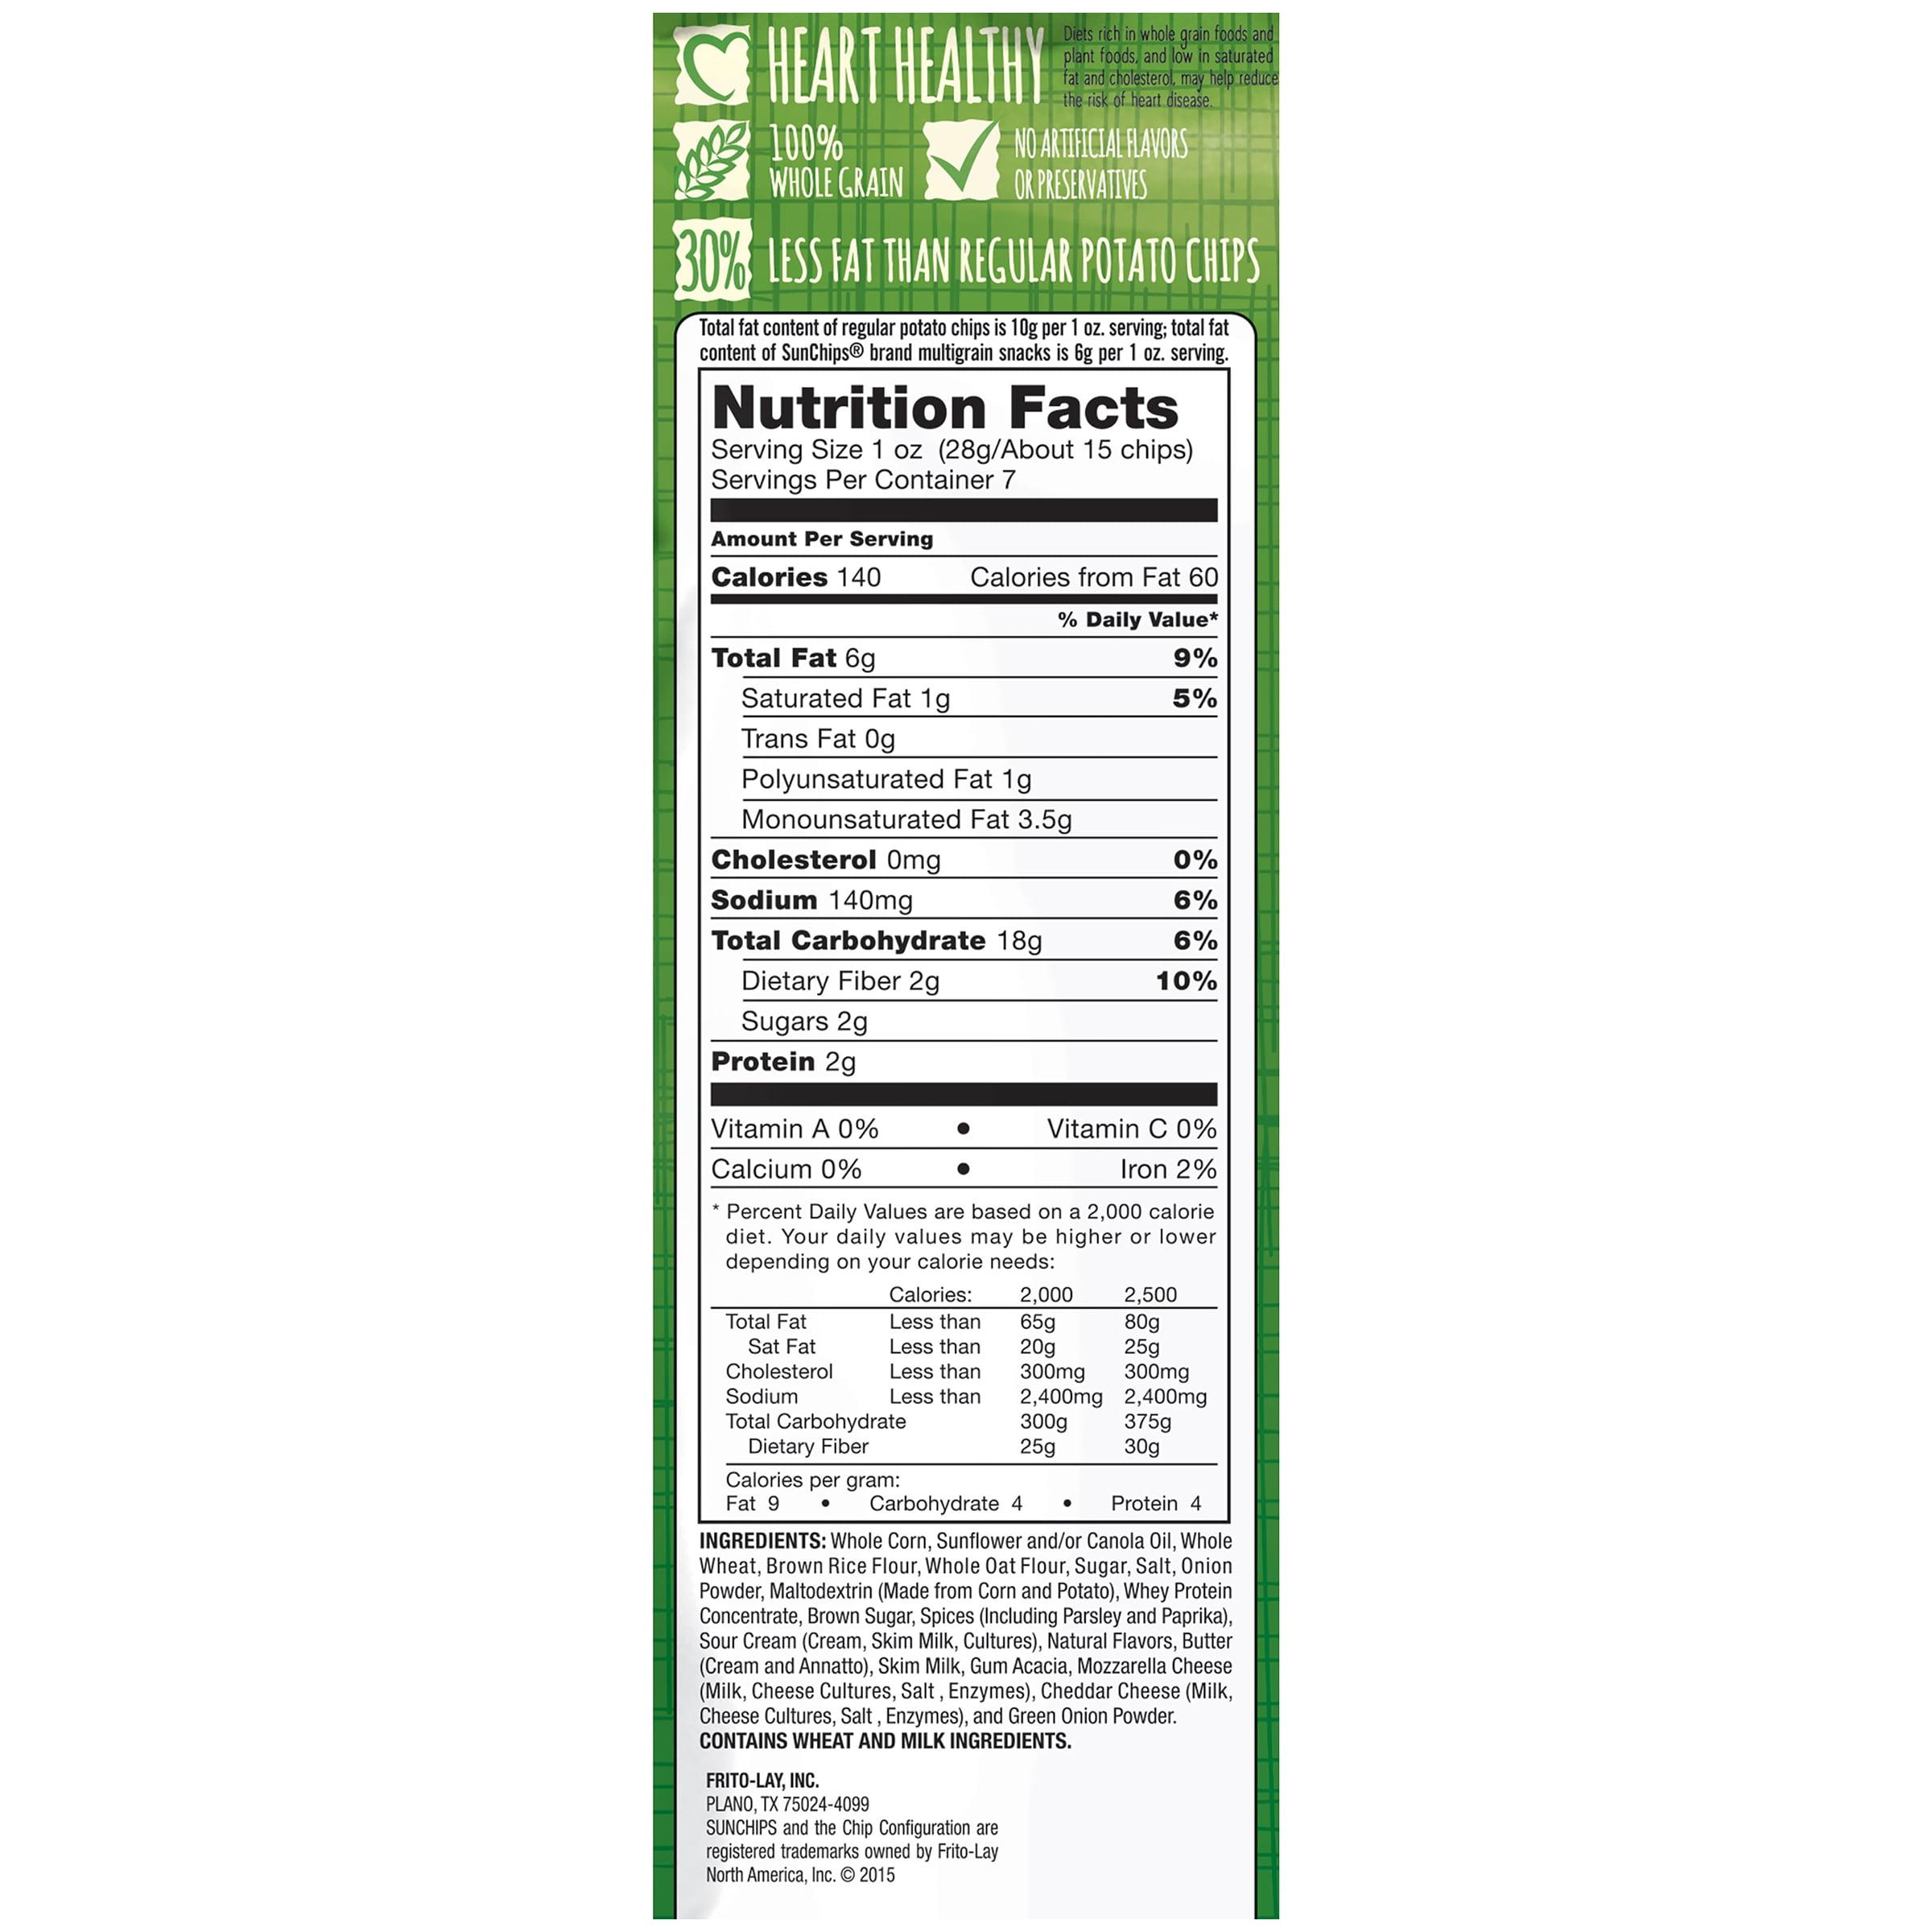 Sun Chips 100 Whole Grain French Onion Flavored Multigrain Snacks